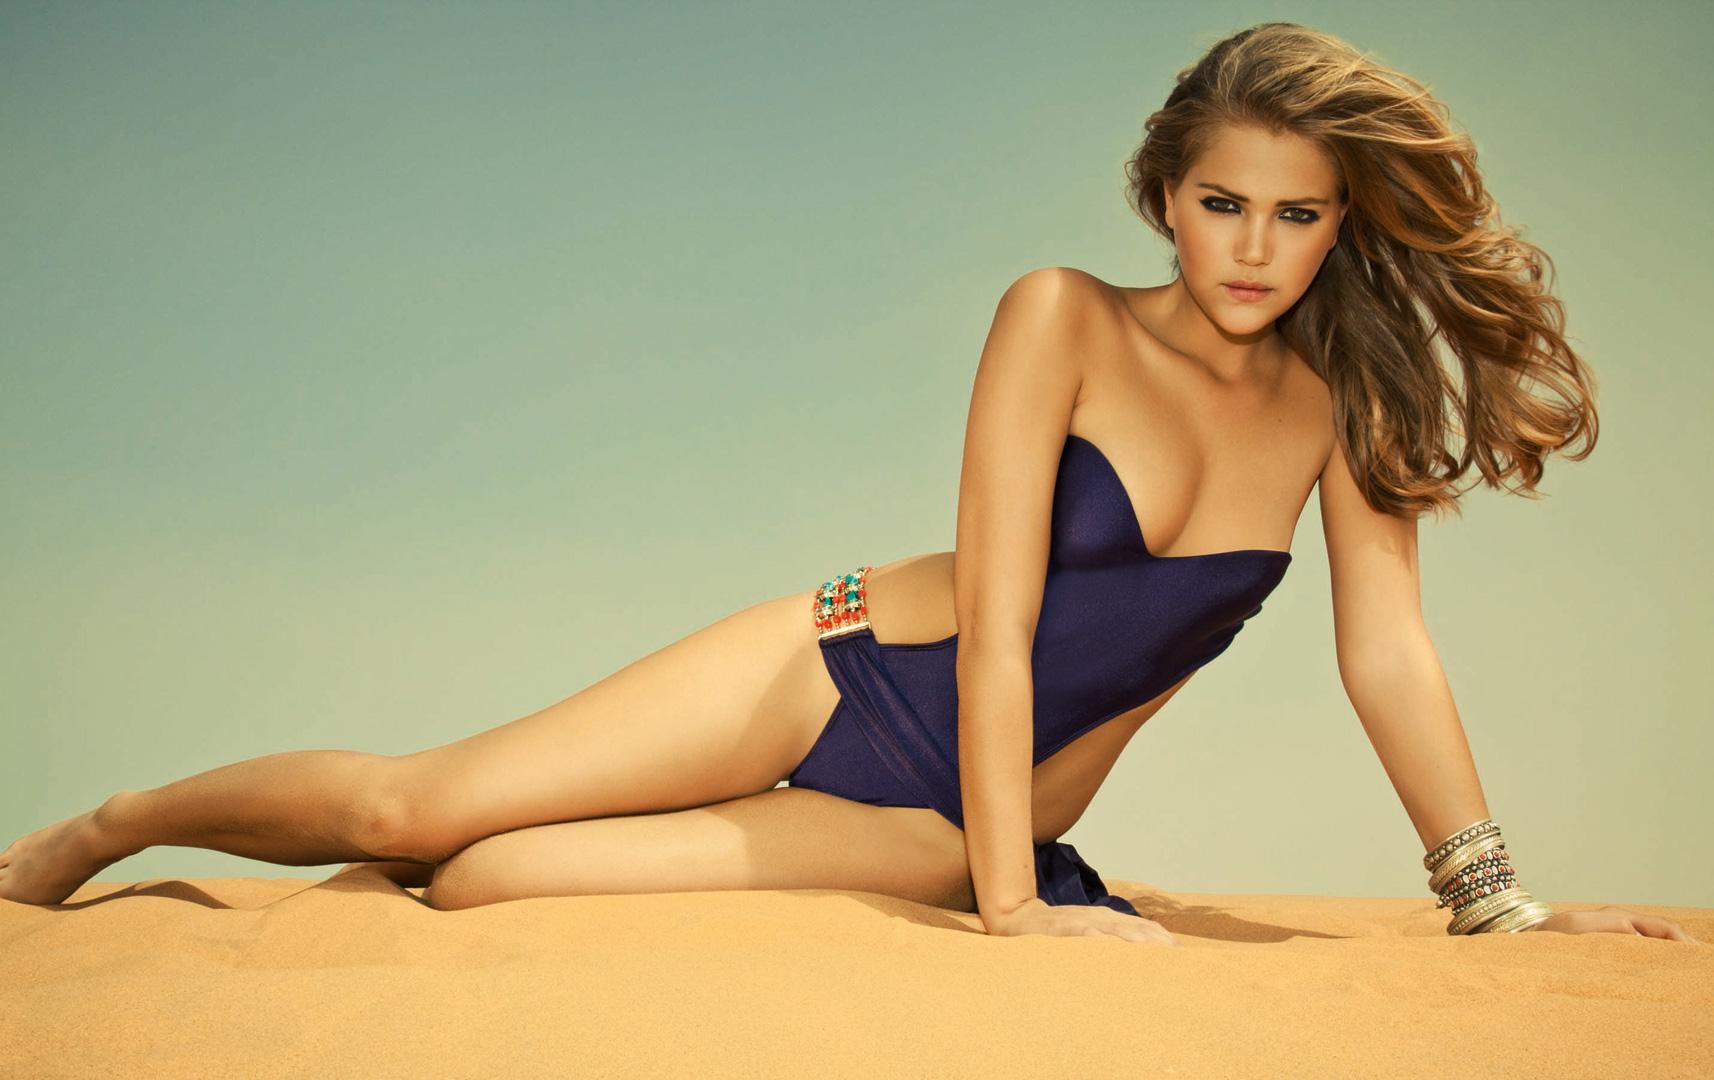 Si swimsuit wallpaper wallpapersafari - Hd bikini wallpapers for pc ...